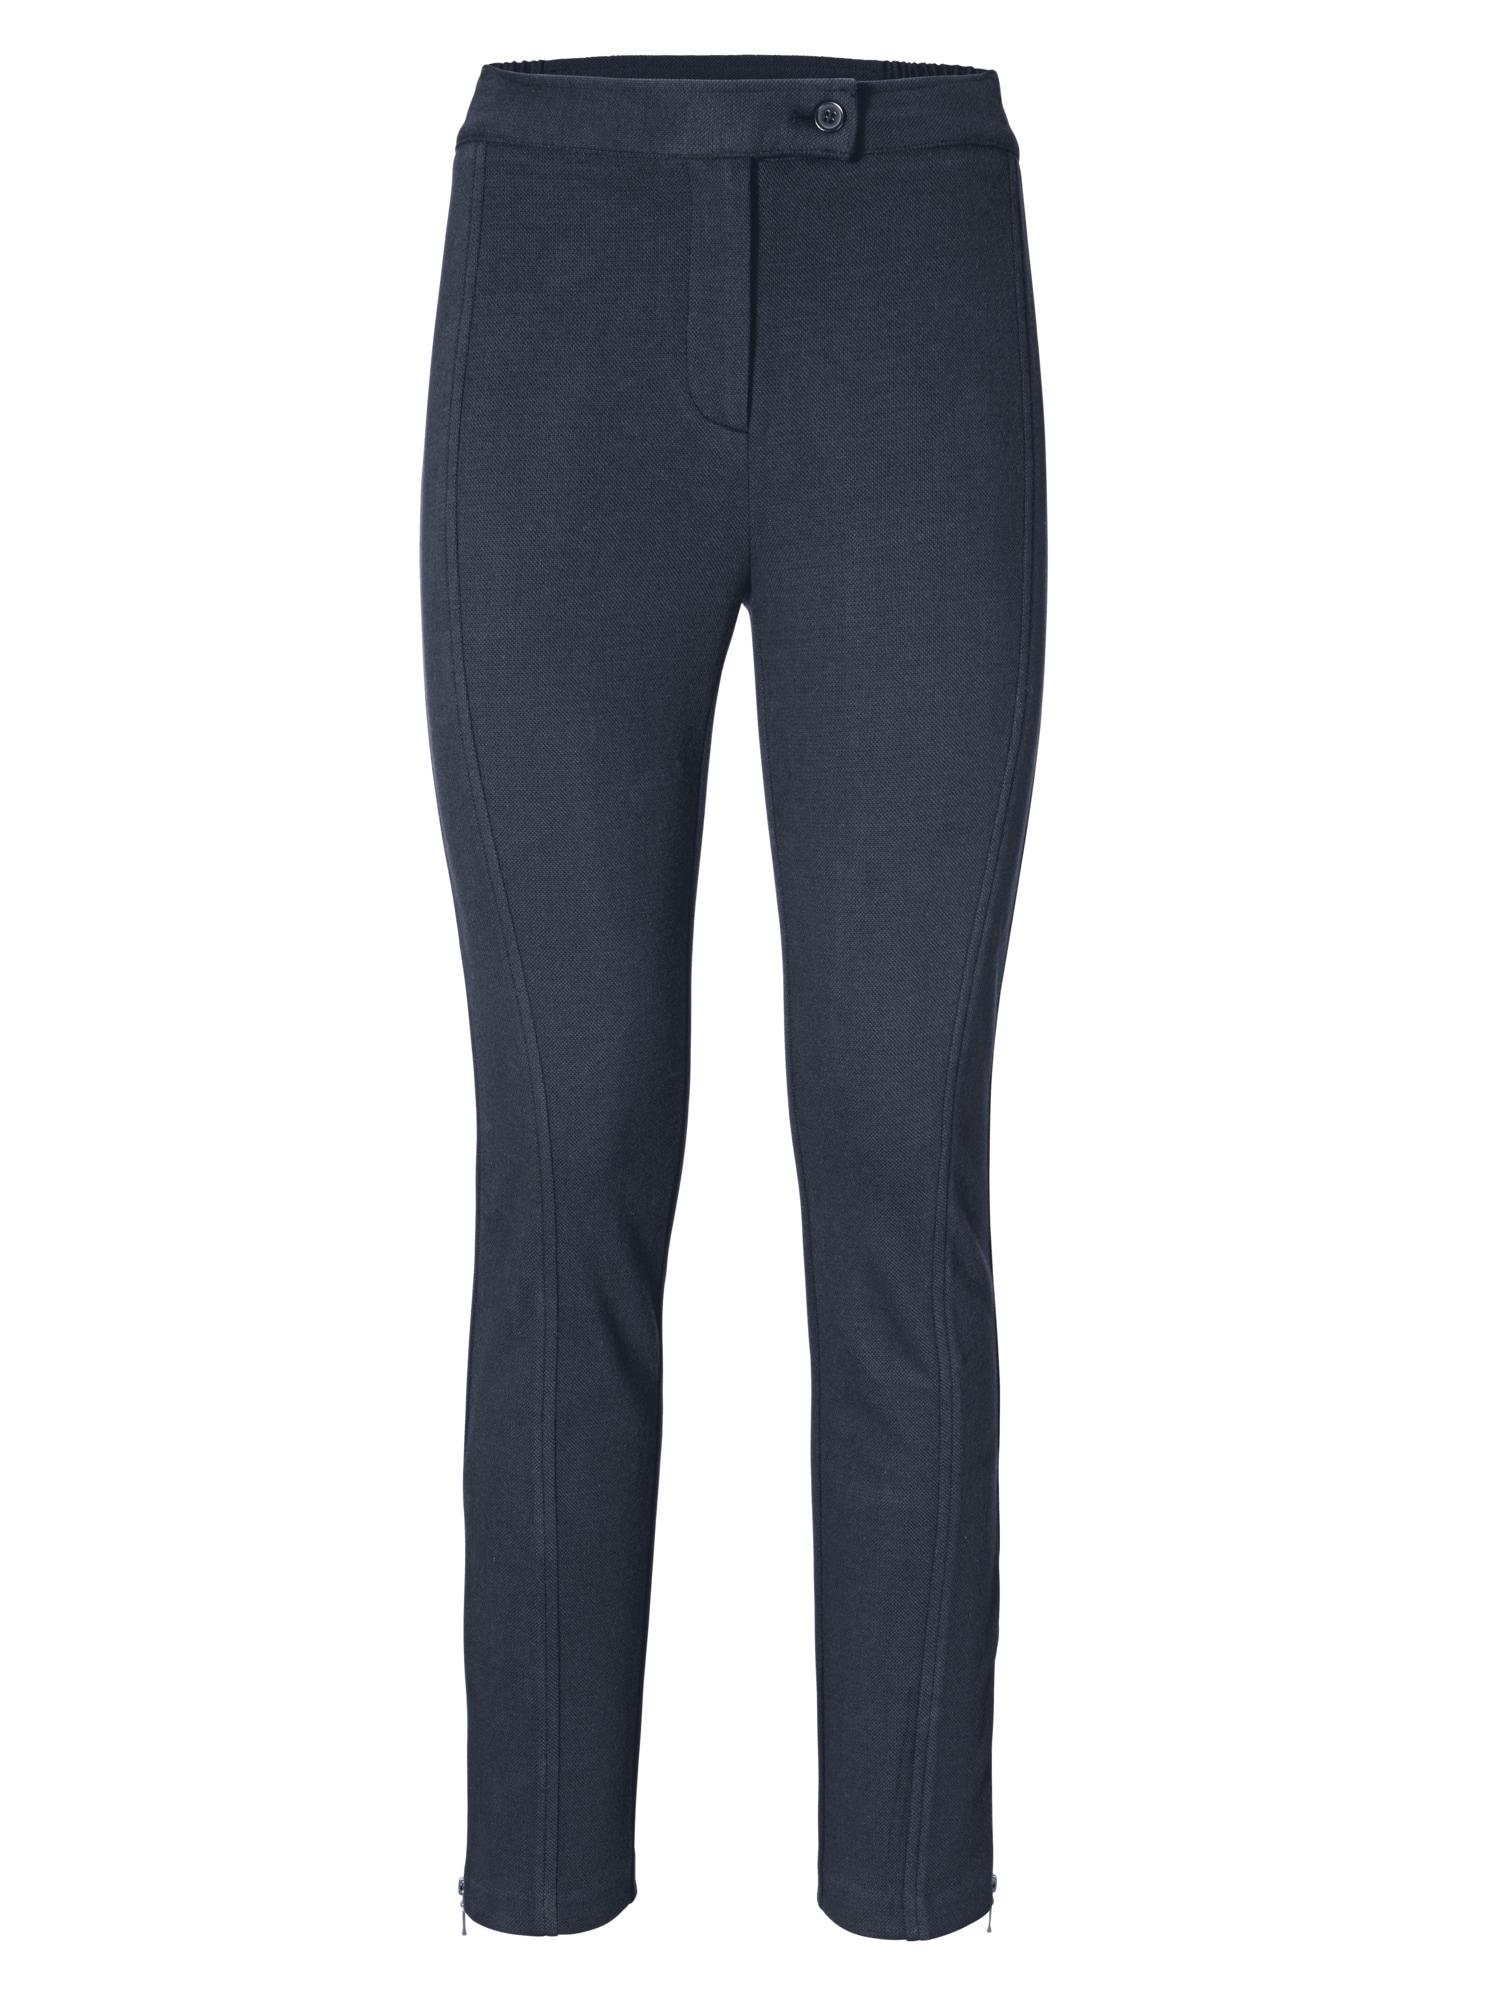 heine TIMELESS Leggings in verkürzter Form | Bekleidung > Hosen > Leggings | Blau | Baumwolle - Elasthan - Ca | Heine Timeless